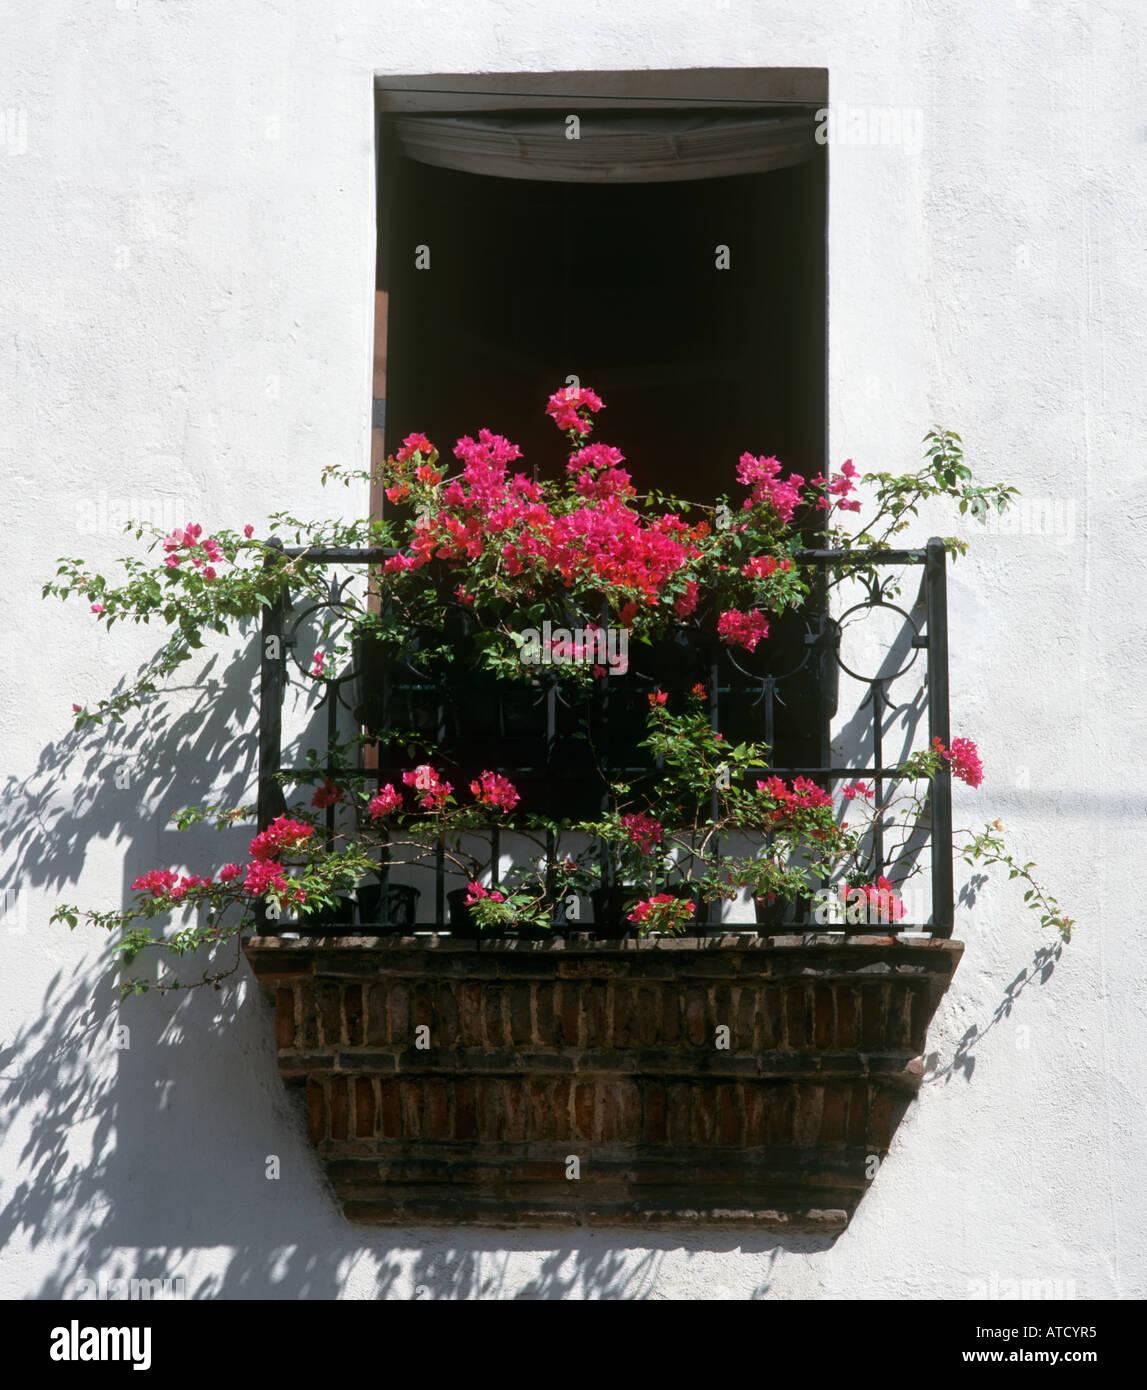 Fenster-Box in der kolonialen Stadt Santo Domingo, Dominikanische Republik, Caribbean Stockbild